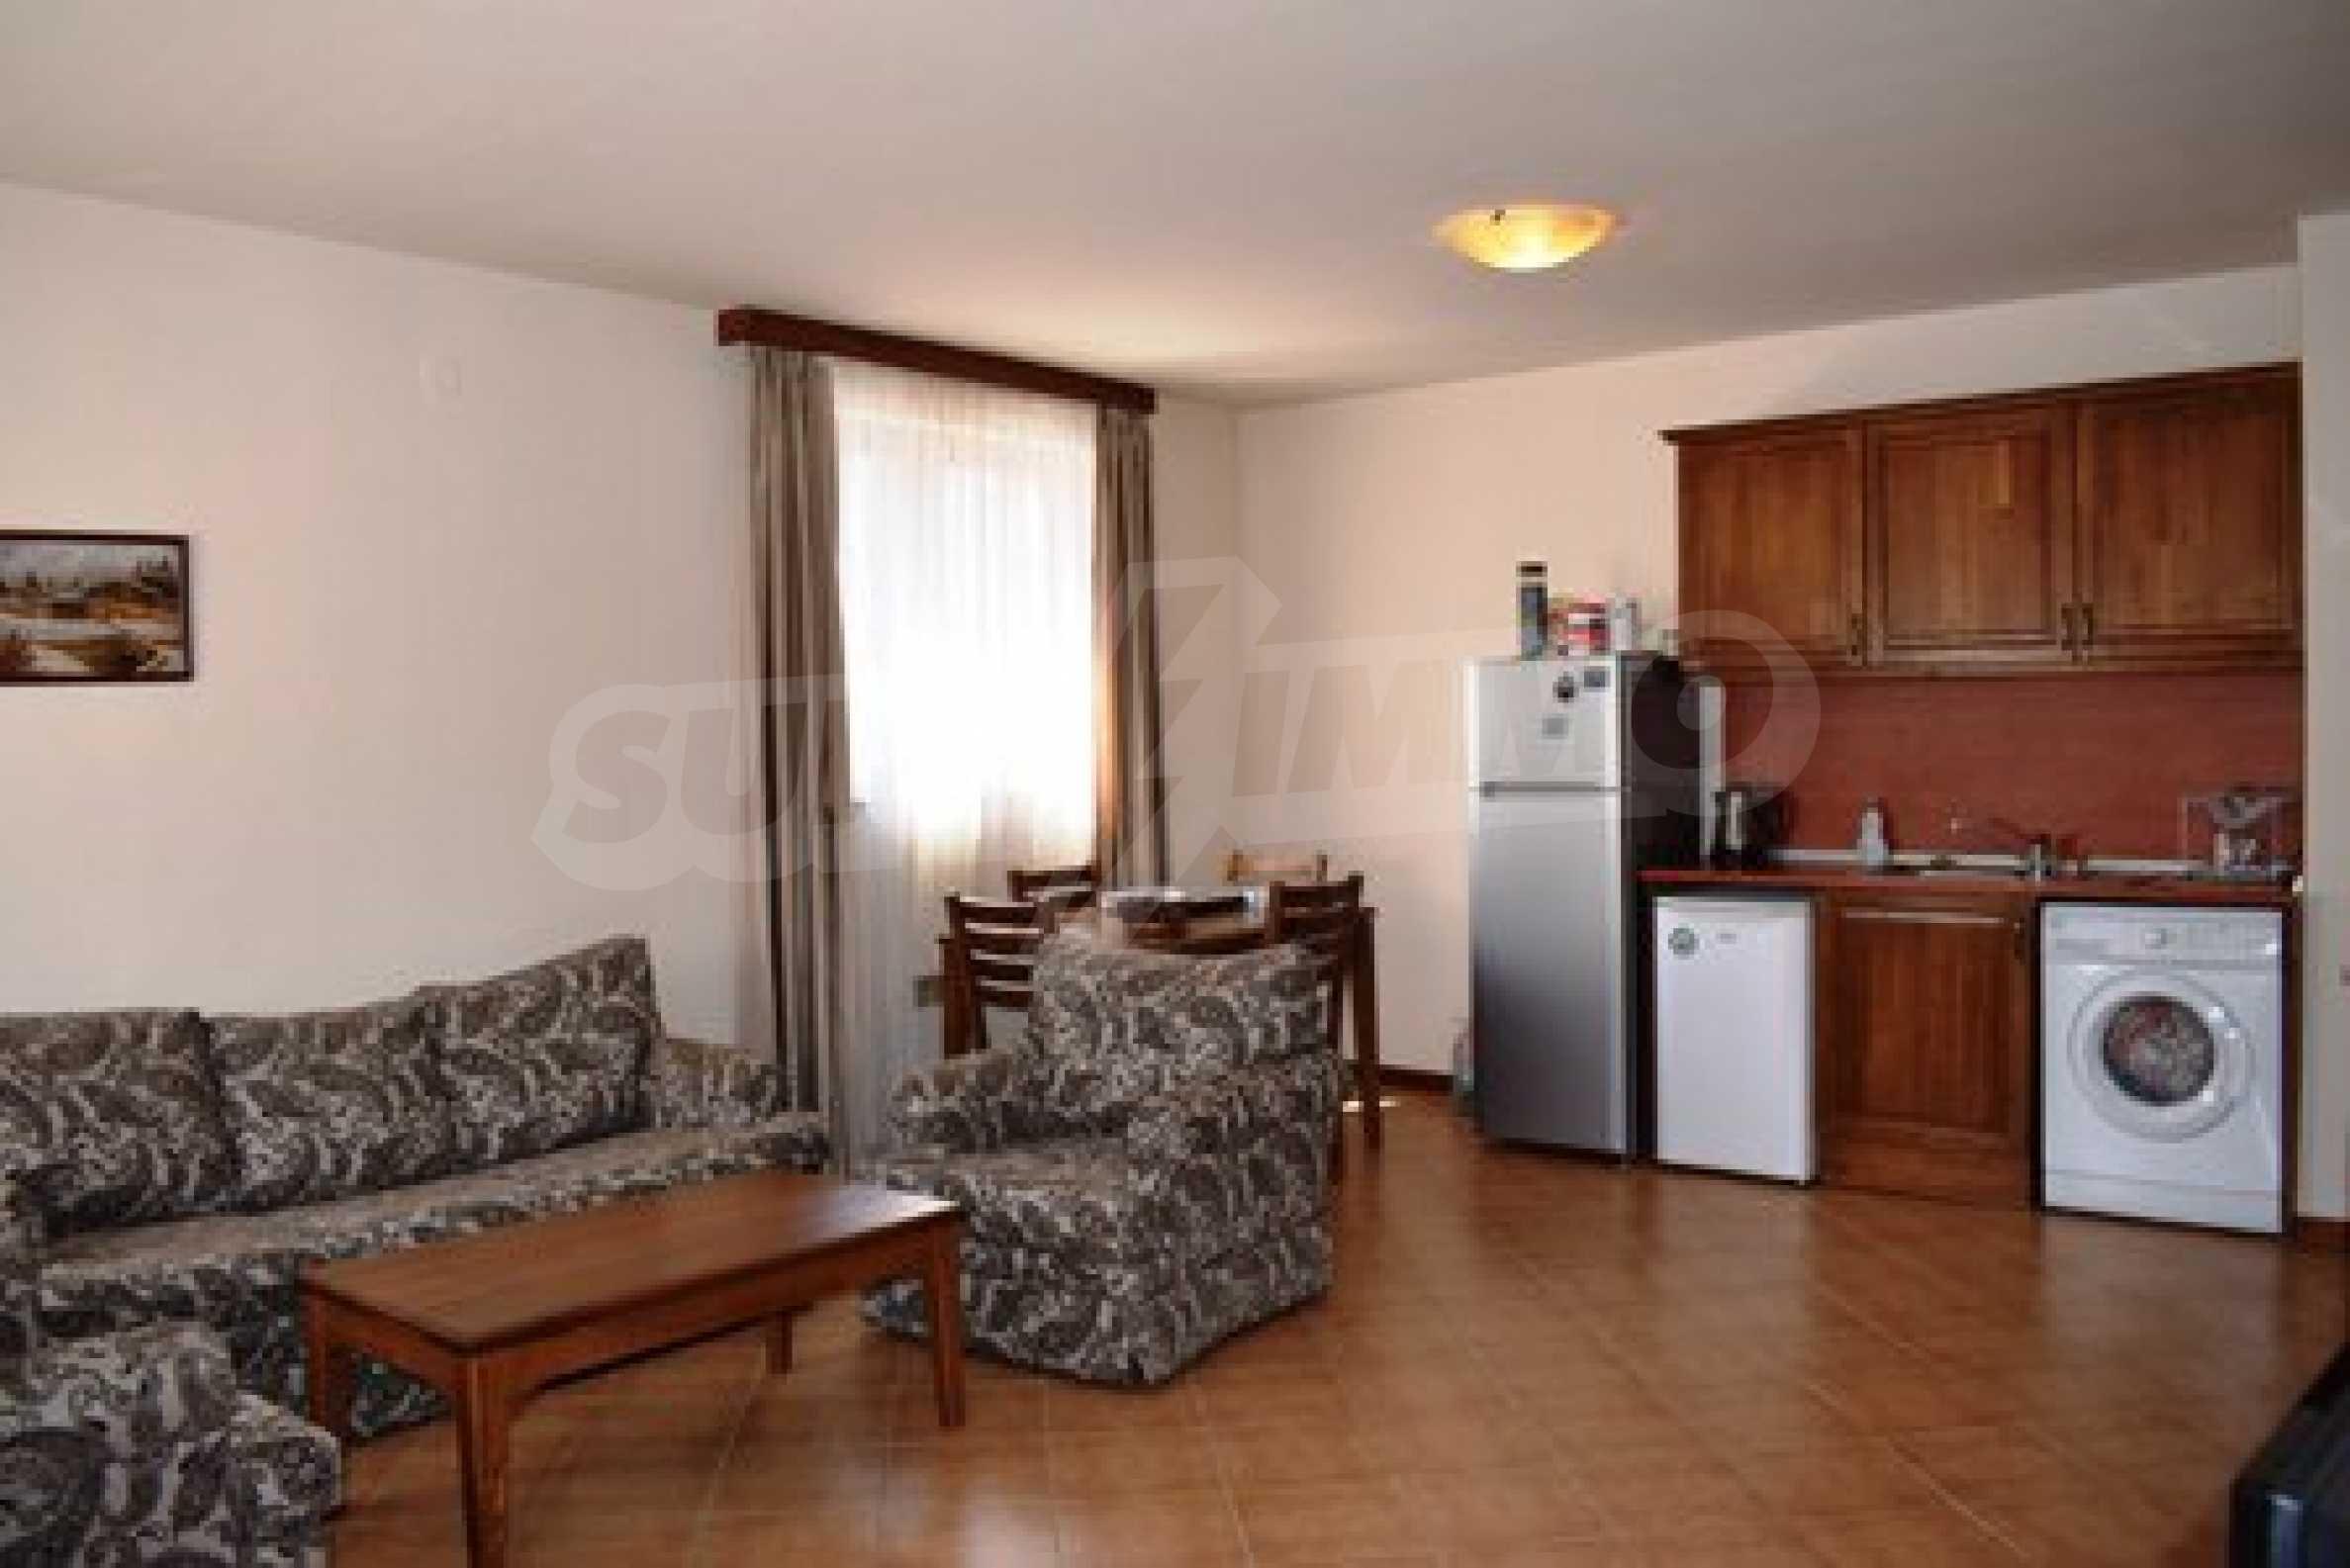 Двустаен апартамент в близост до голф клуб в района на Банско и Разлог 2